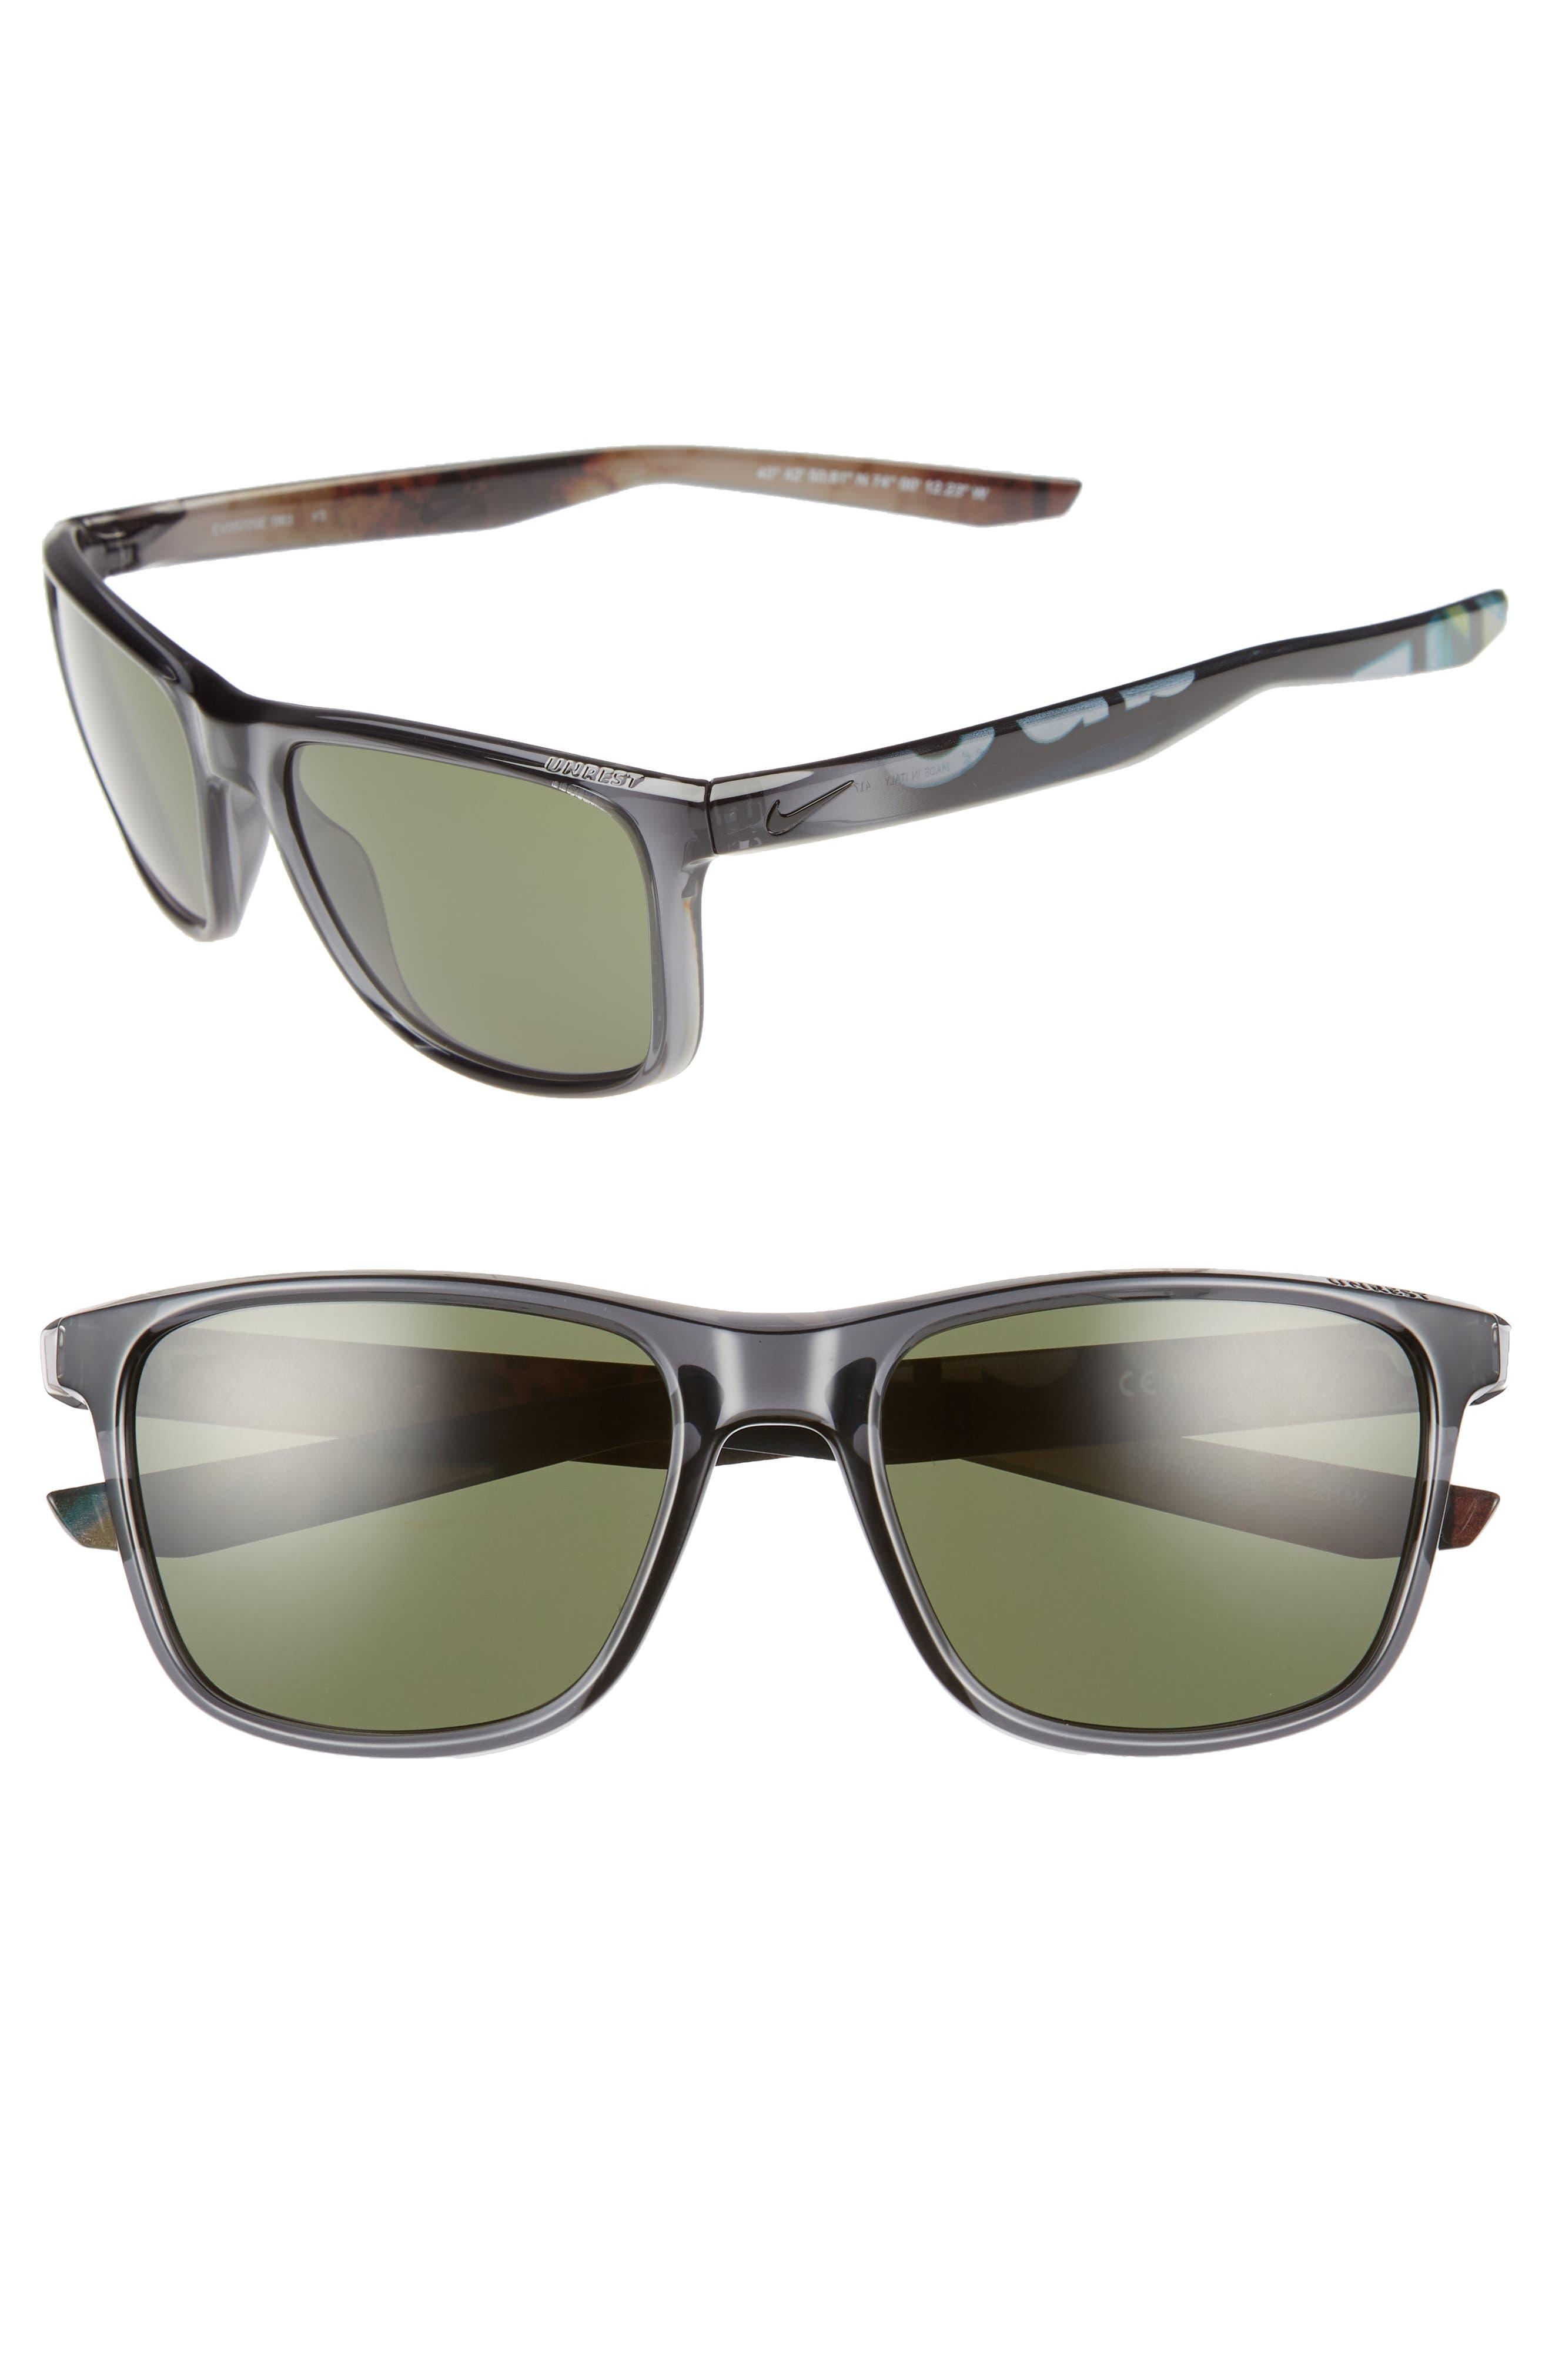 NIKE, Unrest 57mm Sunglasses, Alternate thumbnail 2, color, MATTE OBSIDIAN/ GREY SILVER